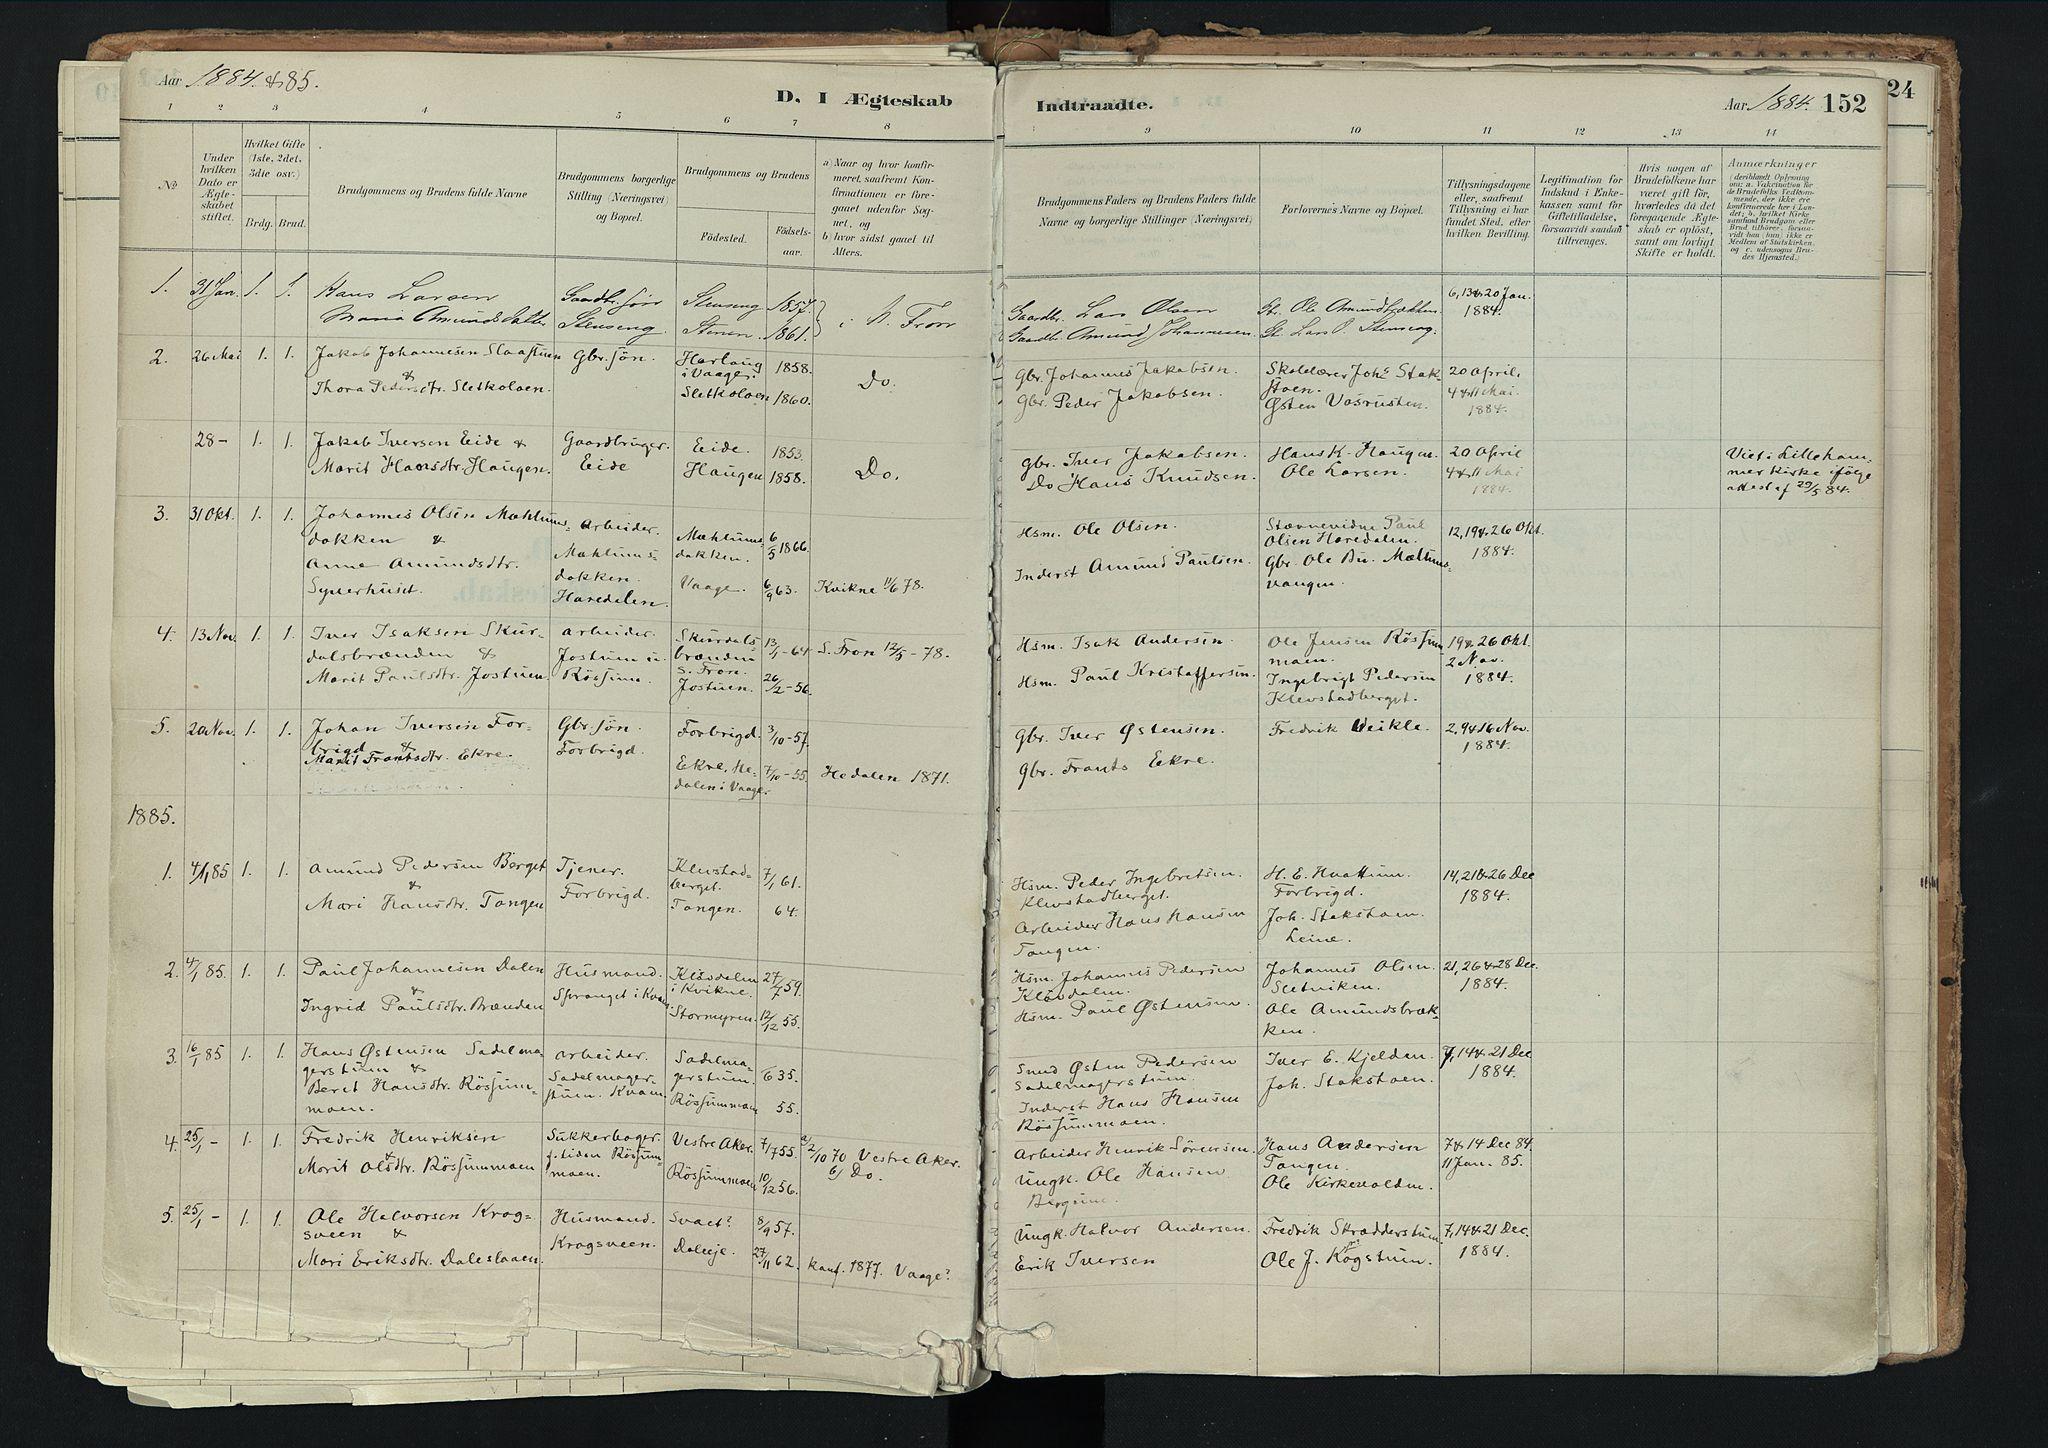 SAH, Nord-Fron prestekontor, Ministerialbok nr. 3, 1884-1914, s. 152